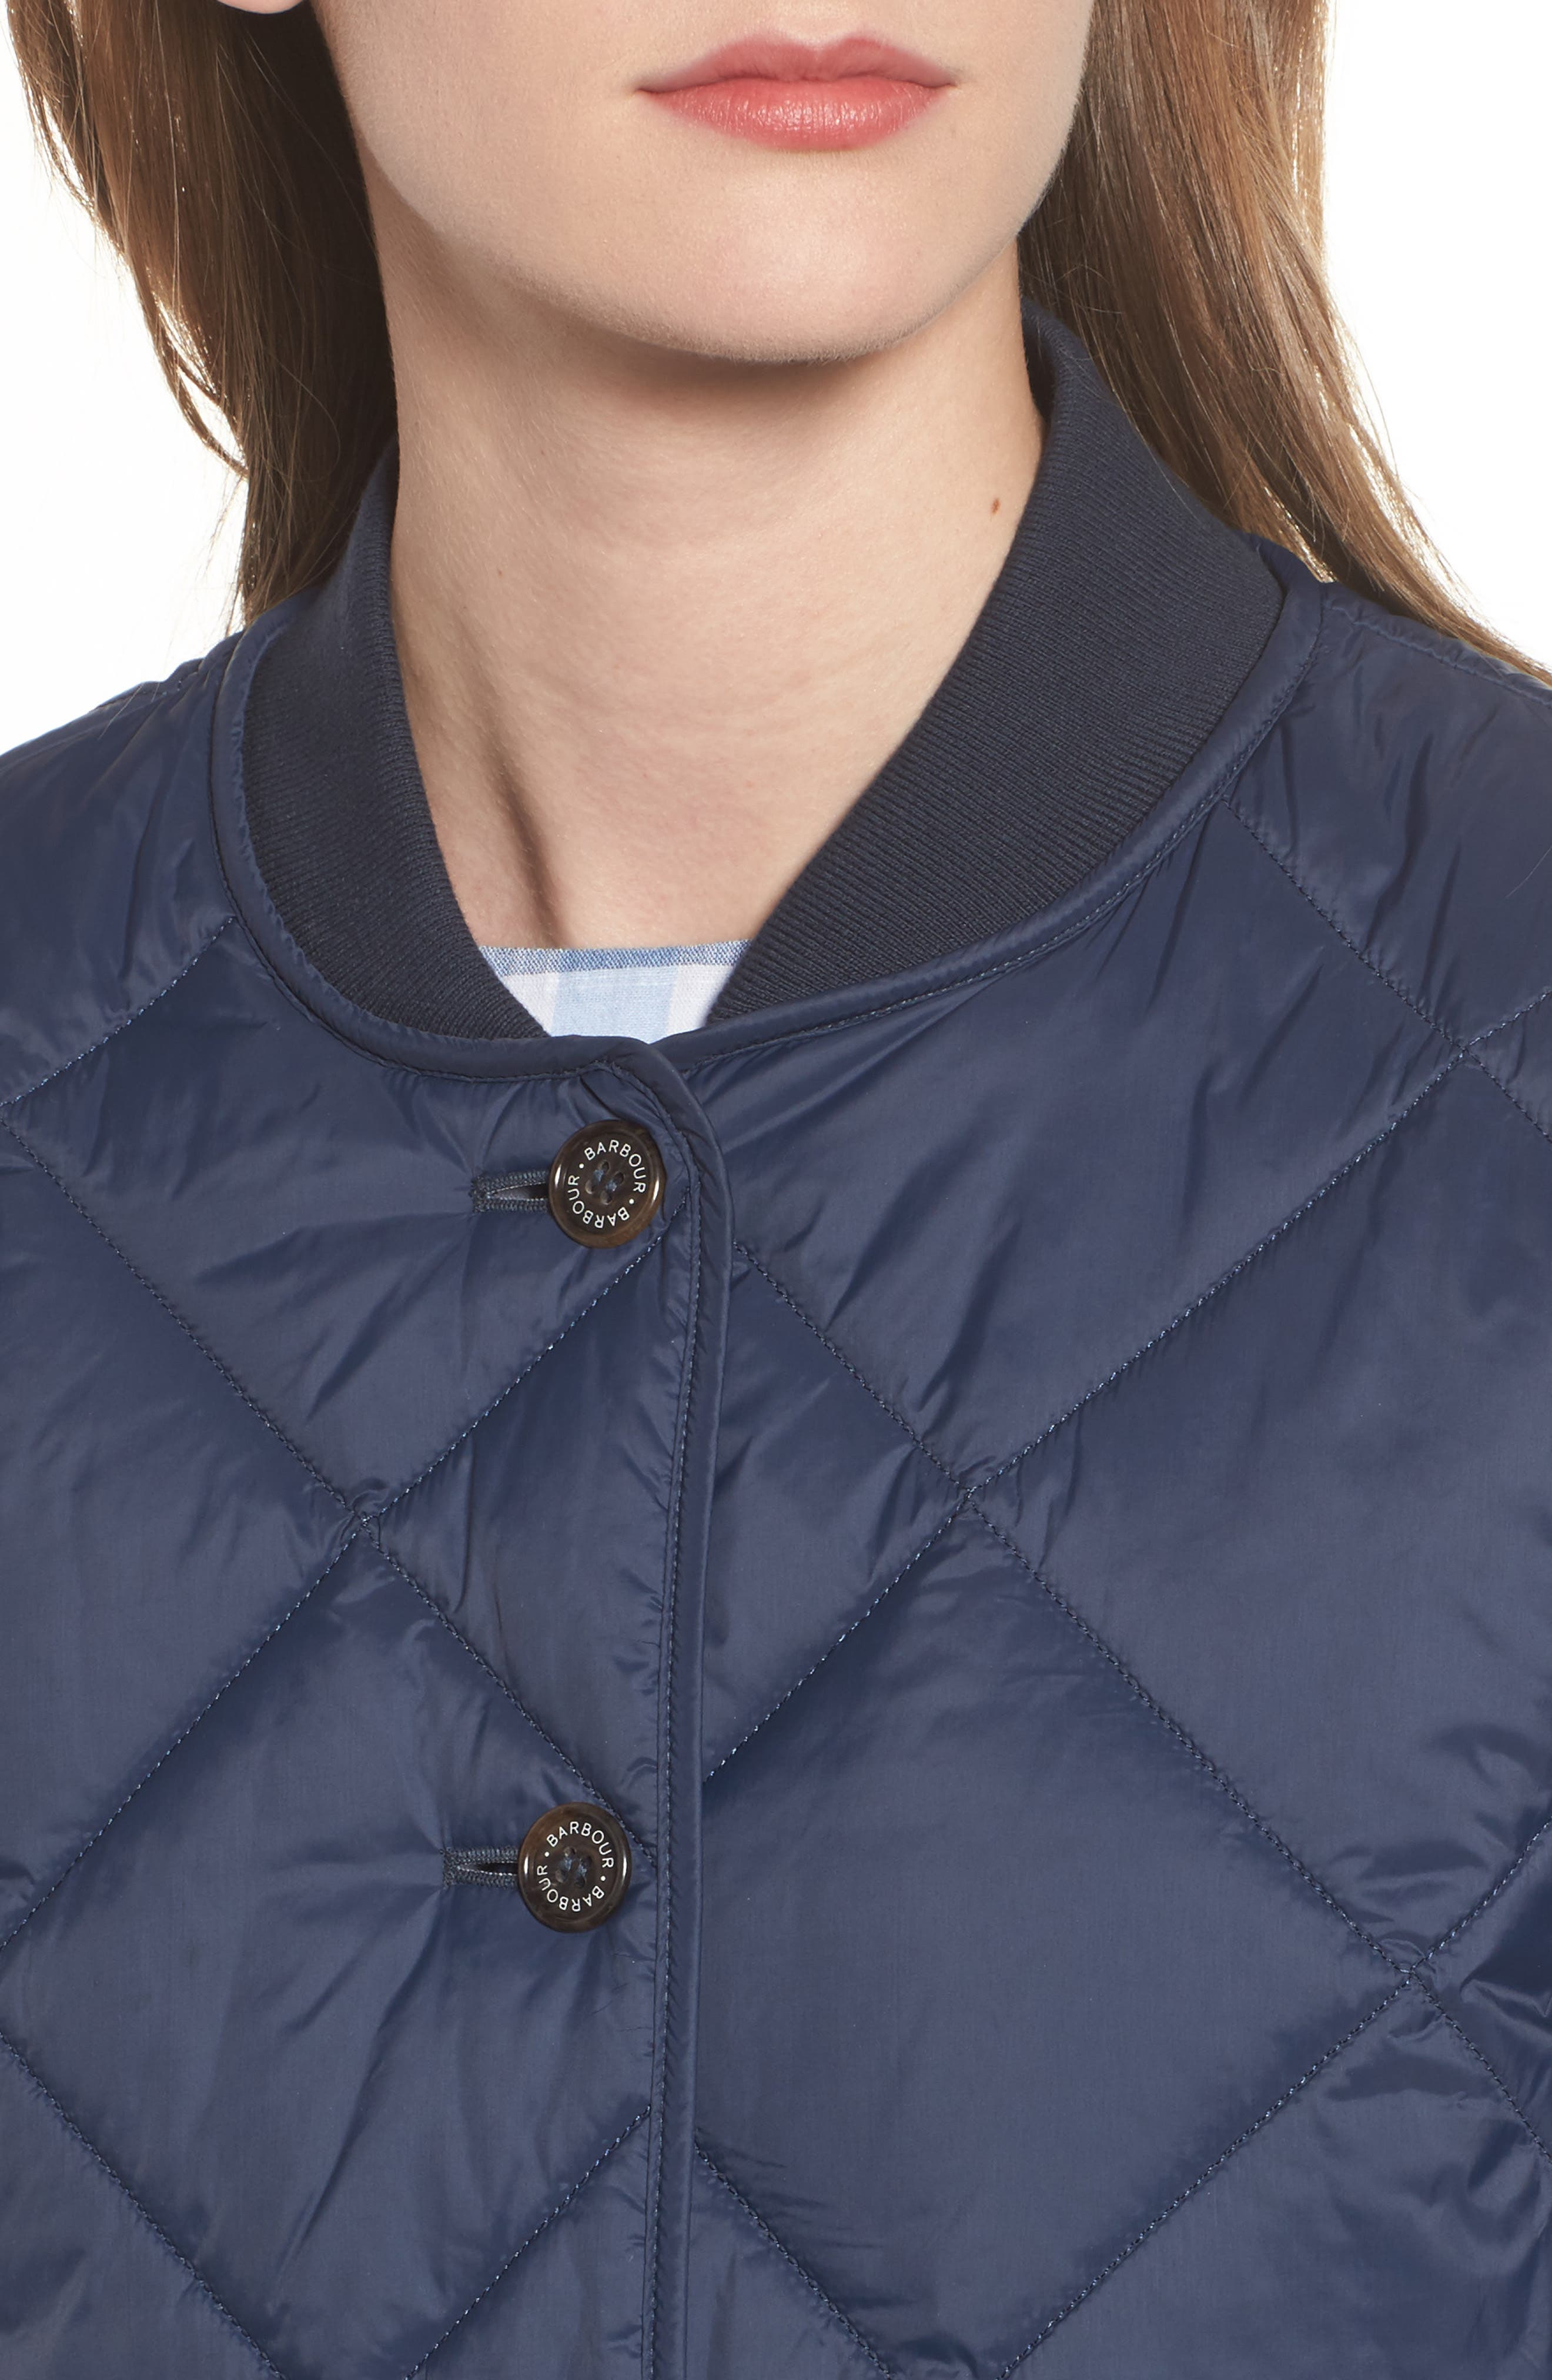 Freckleton Jacket,                             Alternate thumbnail 4, color,                             Royal Navy